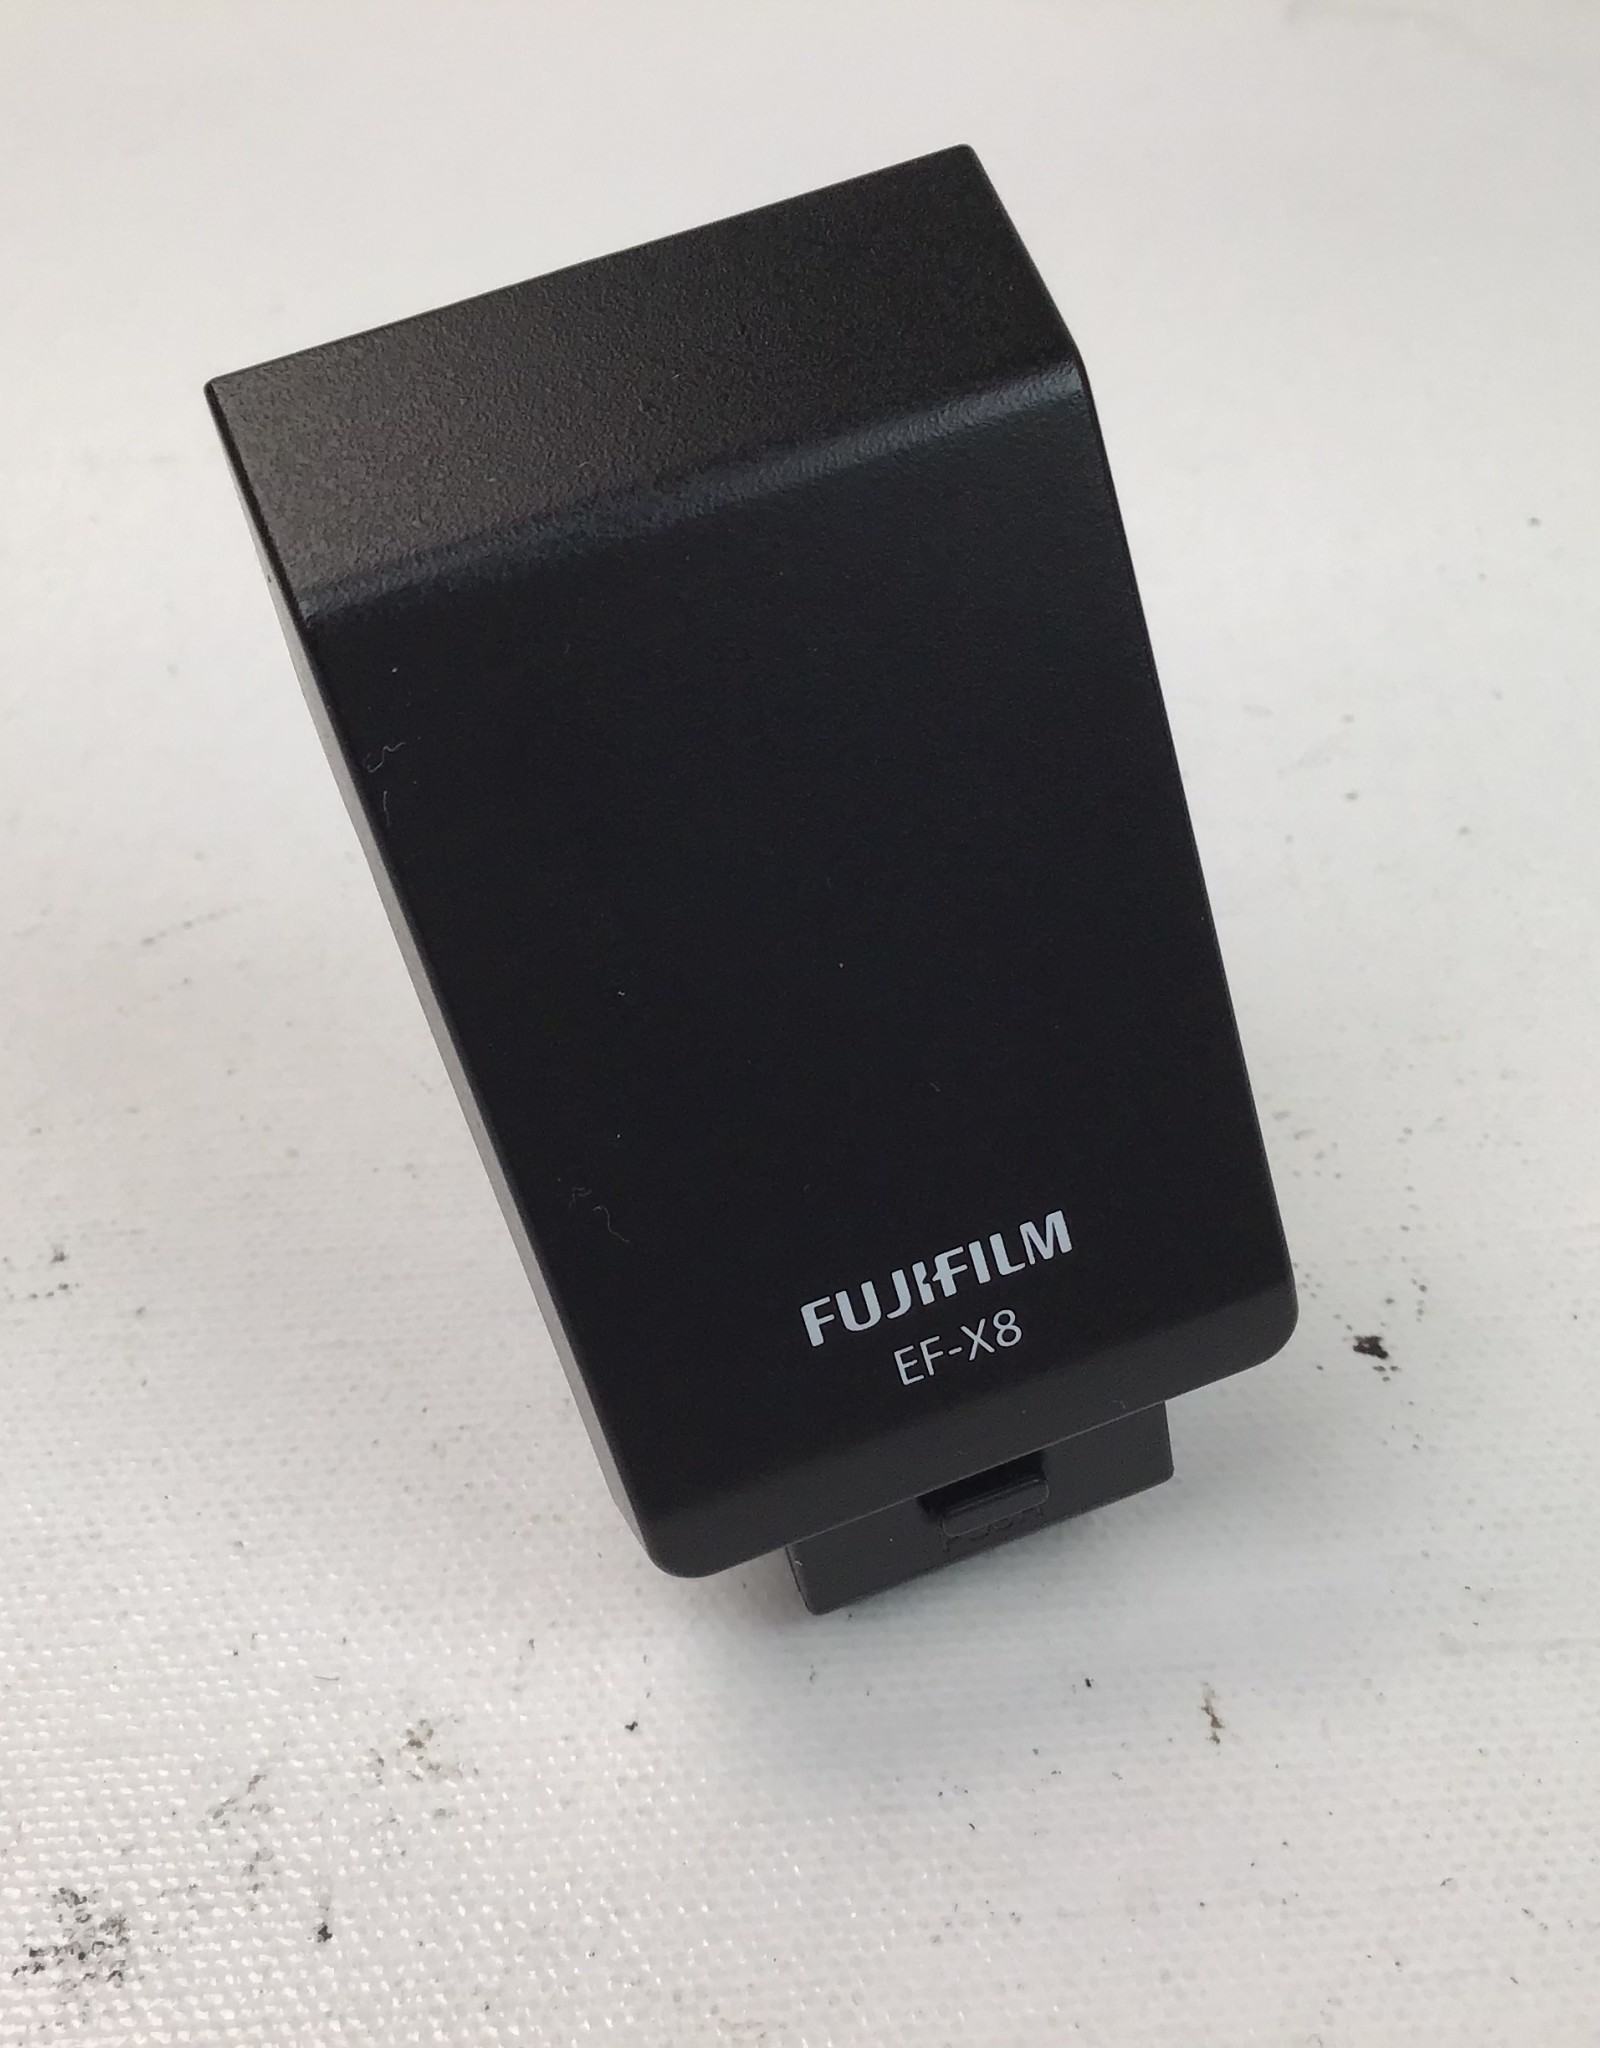 FUJI Fuji EF-X8 Flash Used Mint